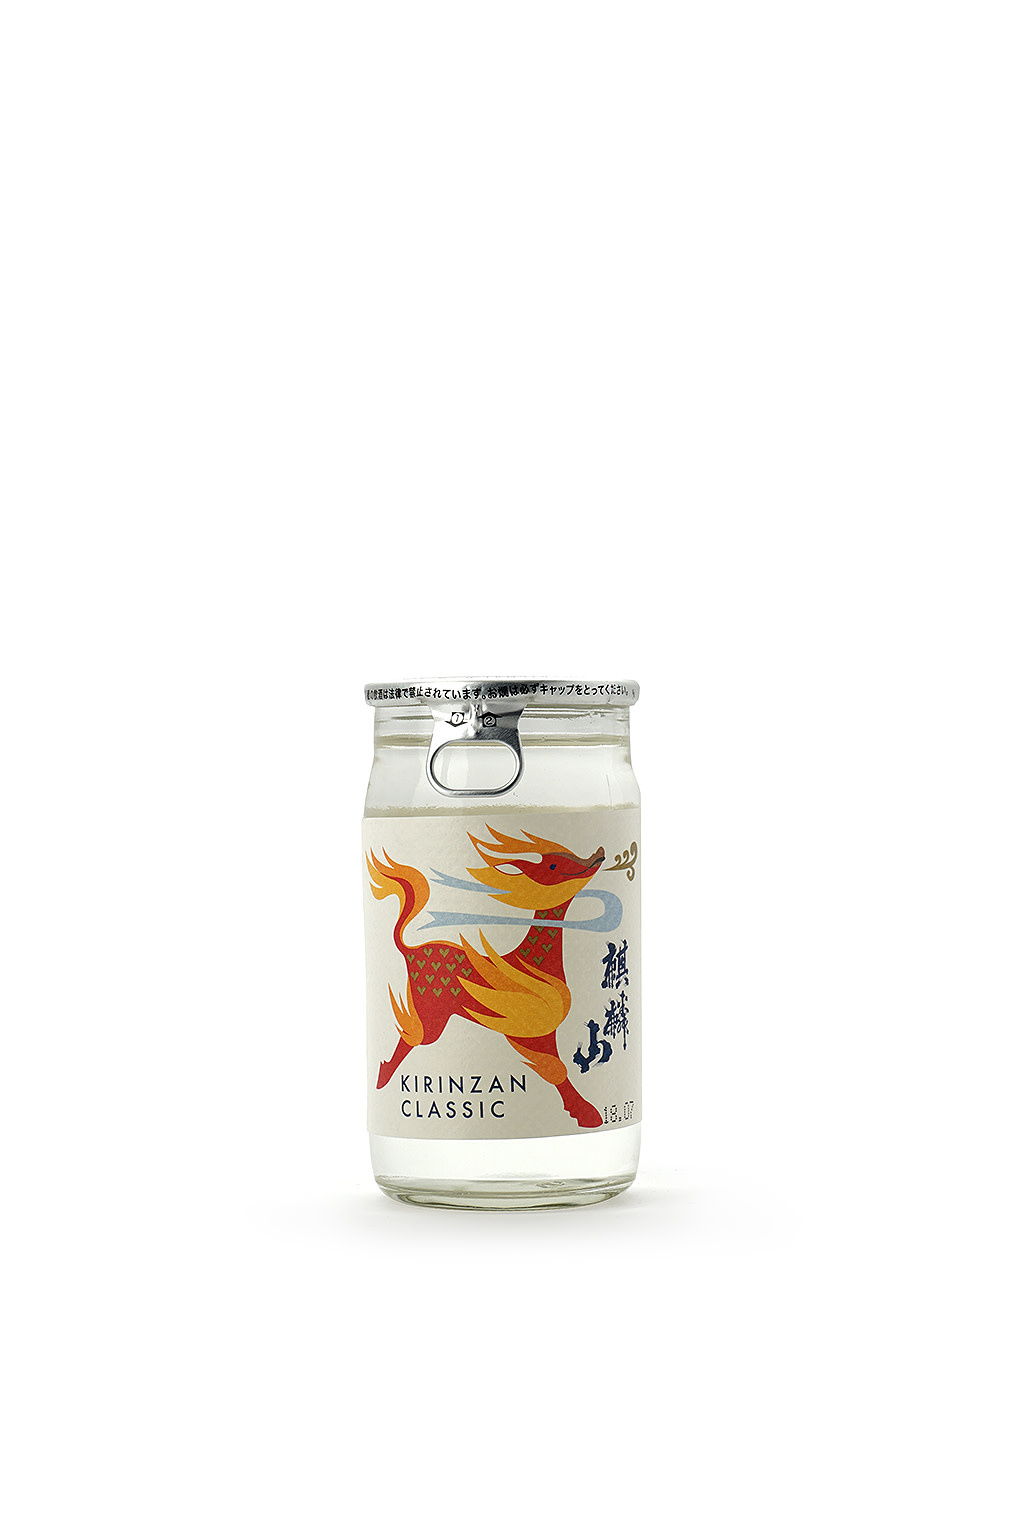 Kirinzan Sake Classic 180ml